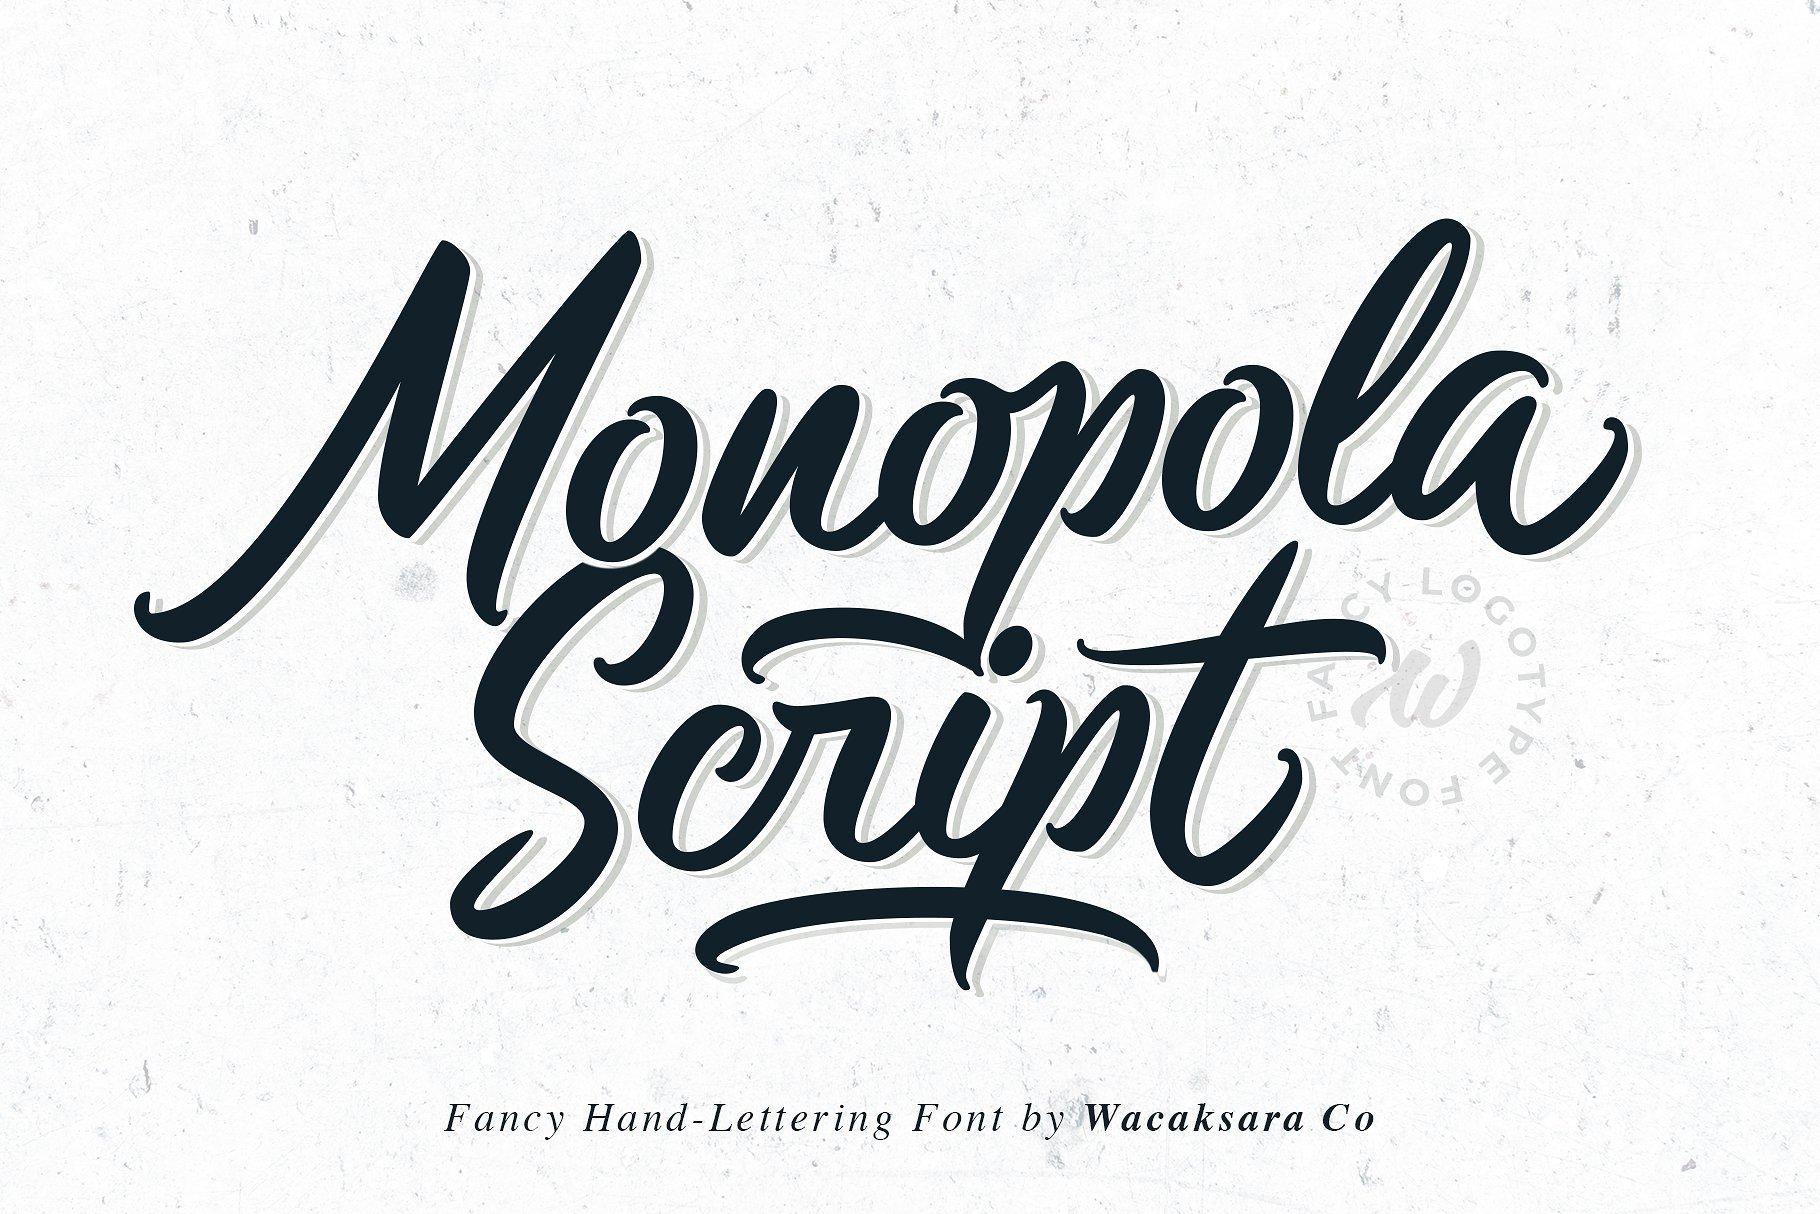 monopola-script-font